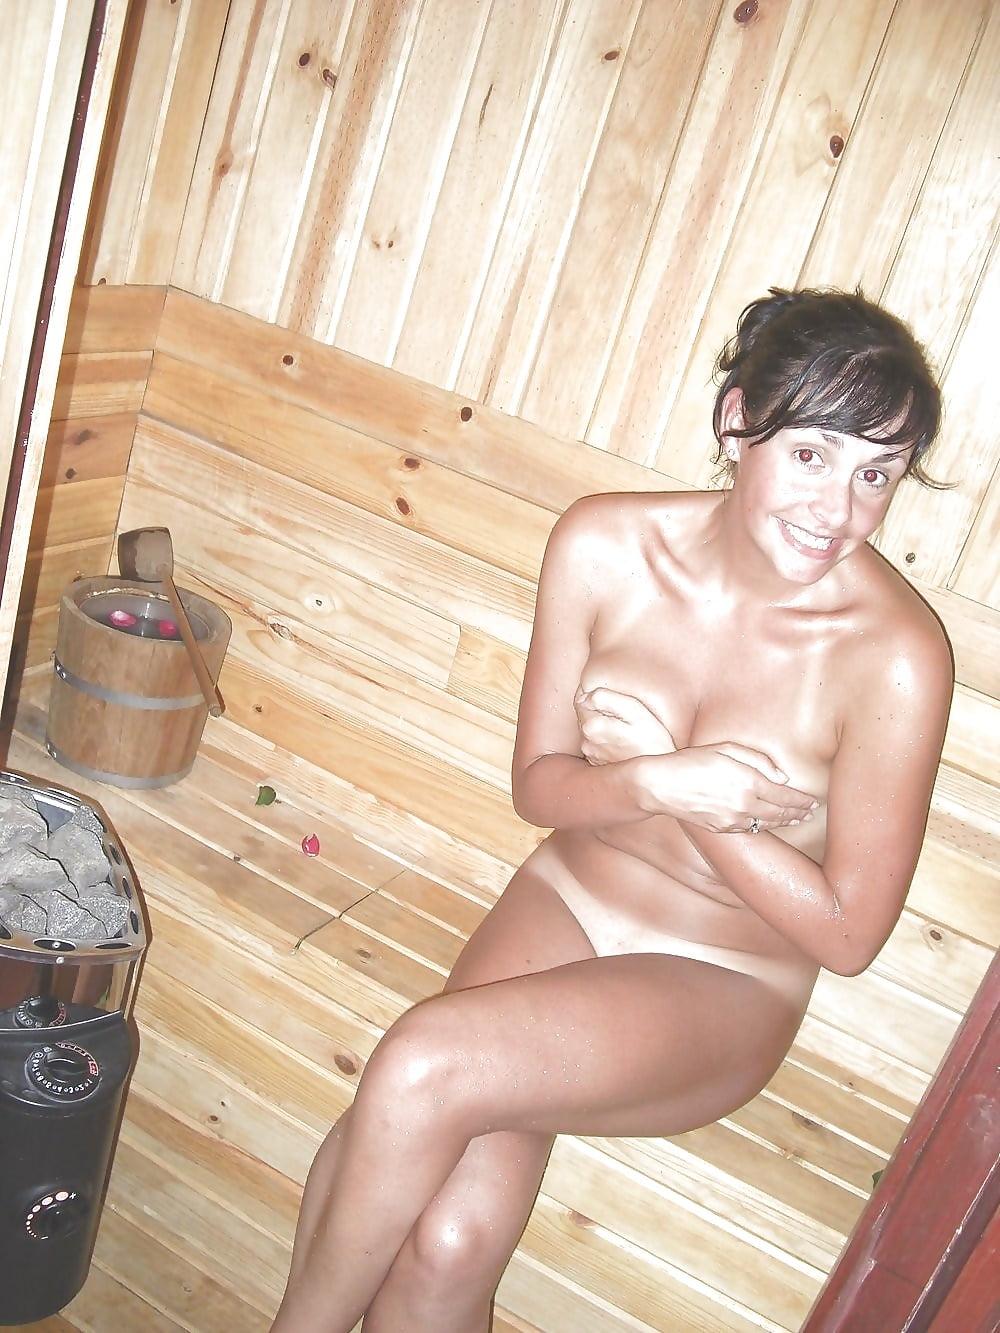 Nude spa sauna girl